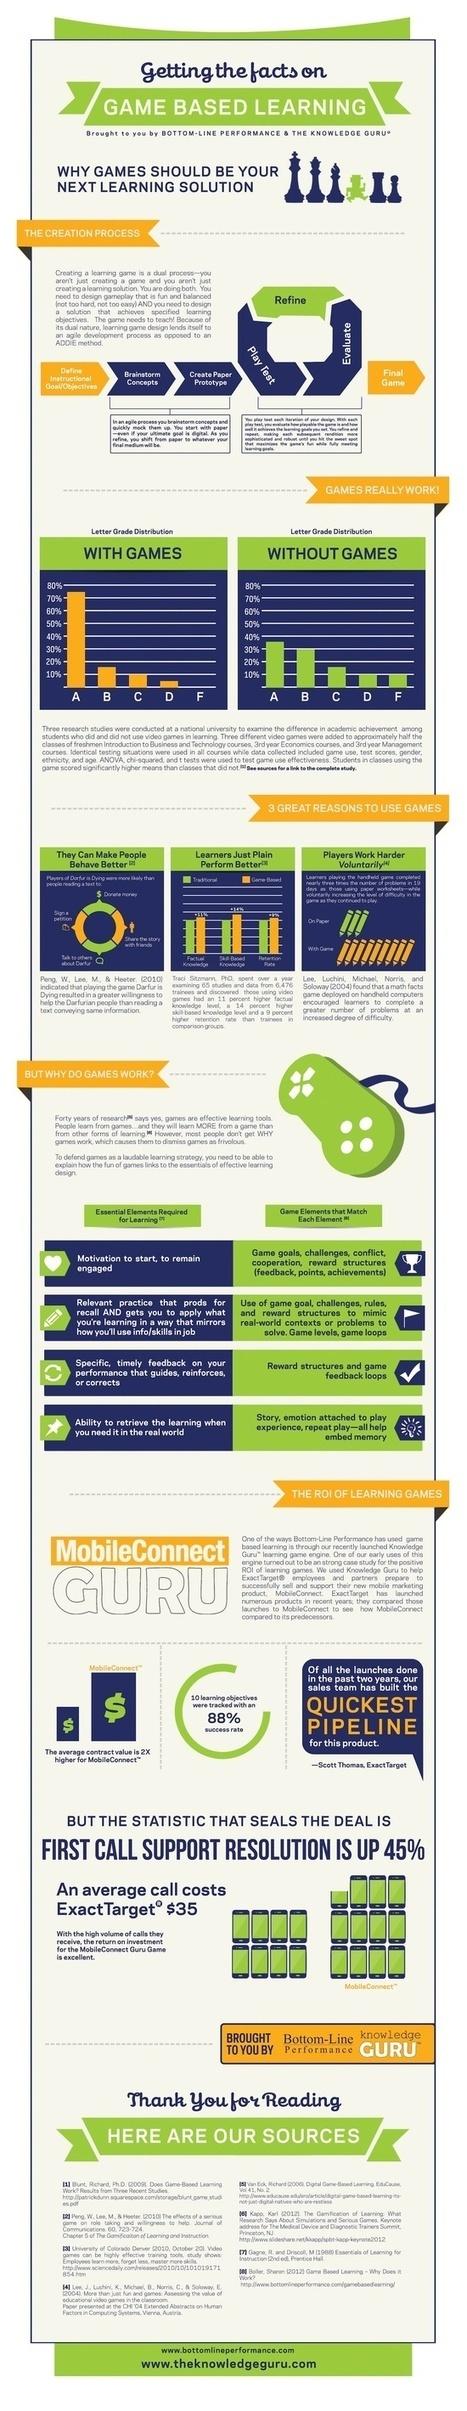 eLearning Infographics | Interest | Scoop.it